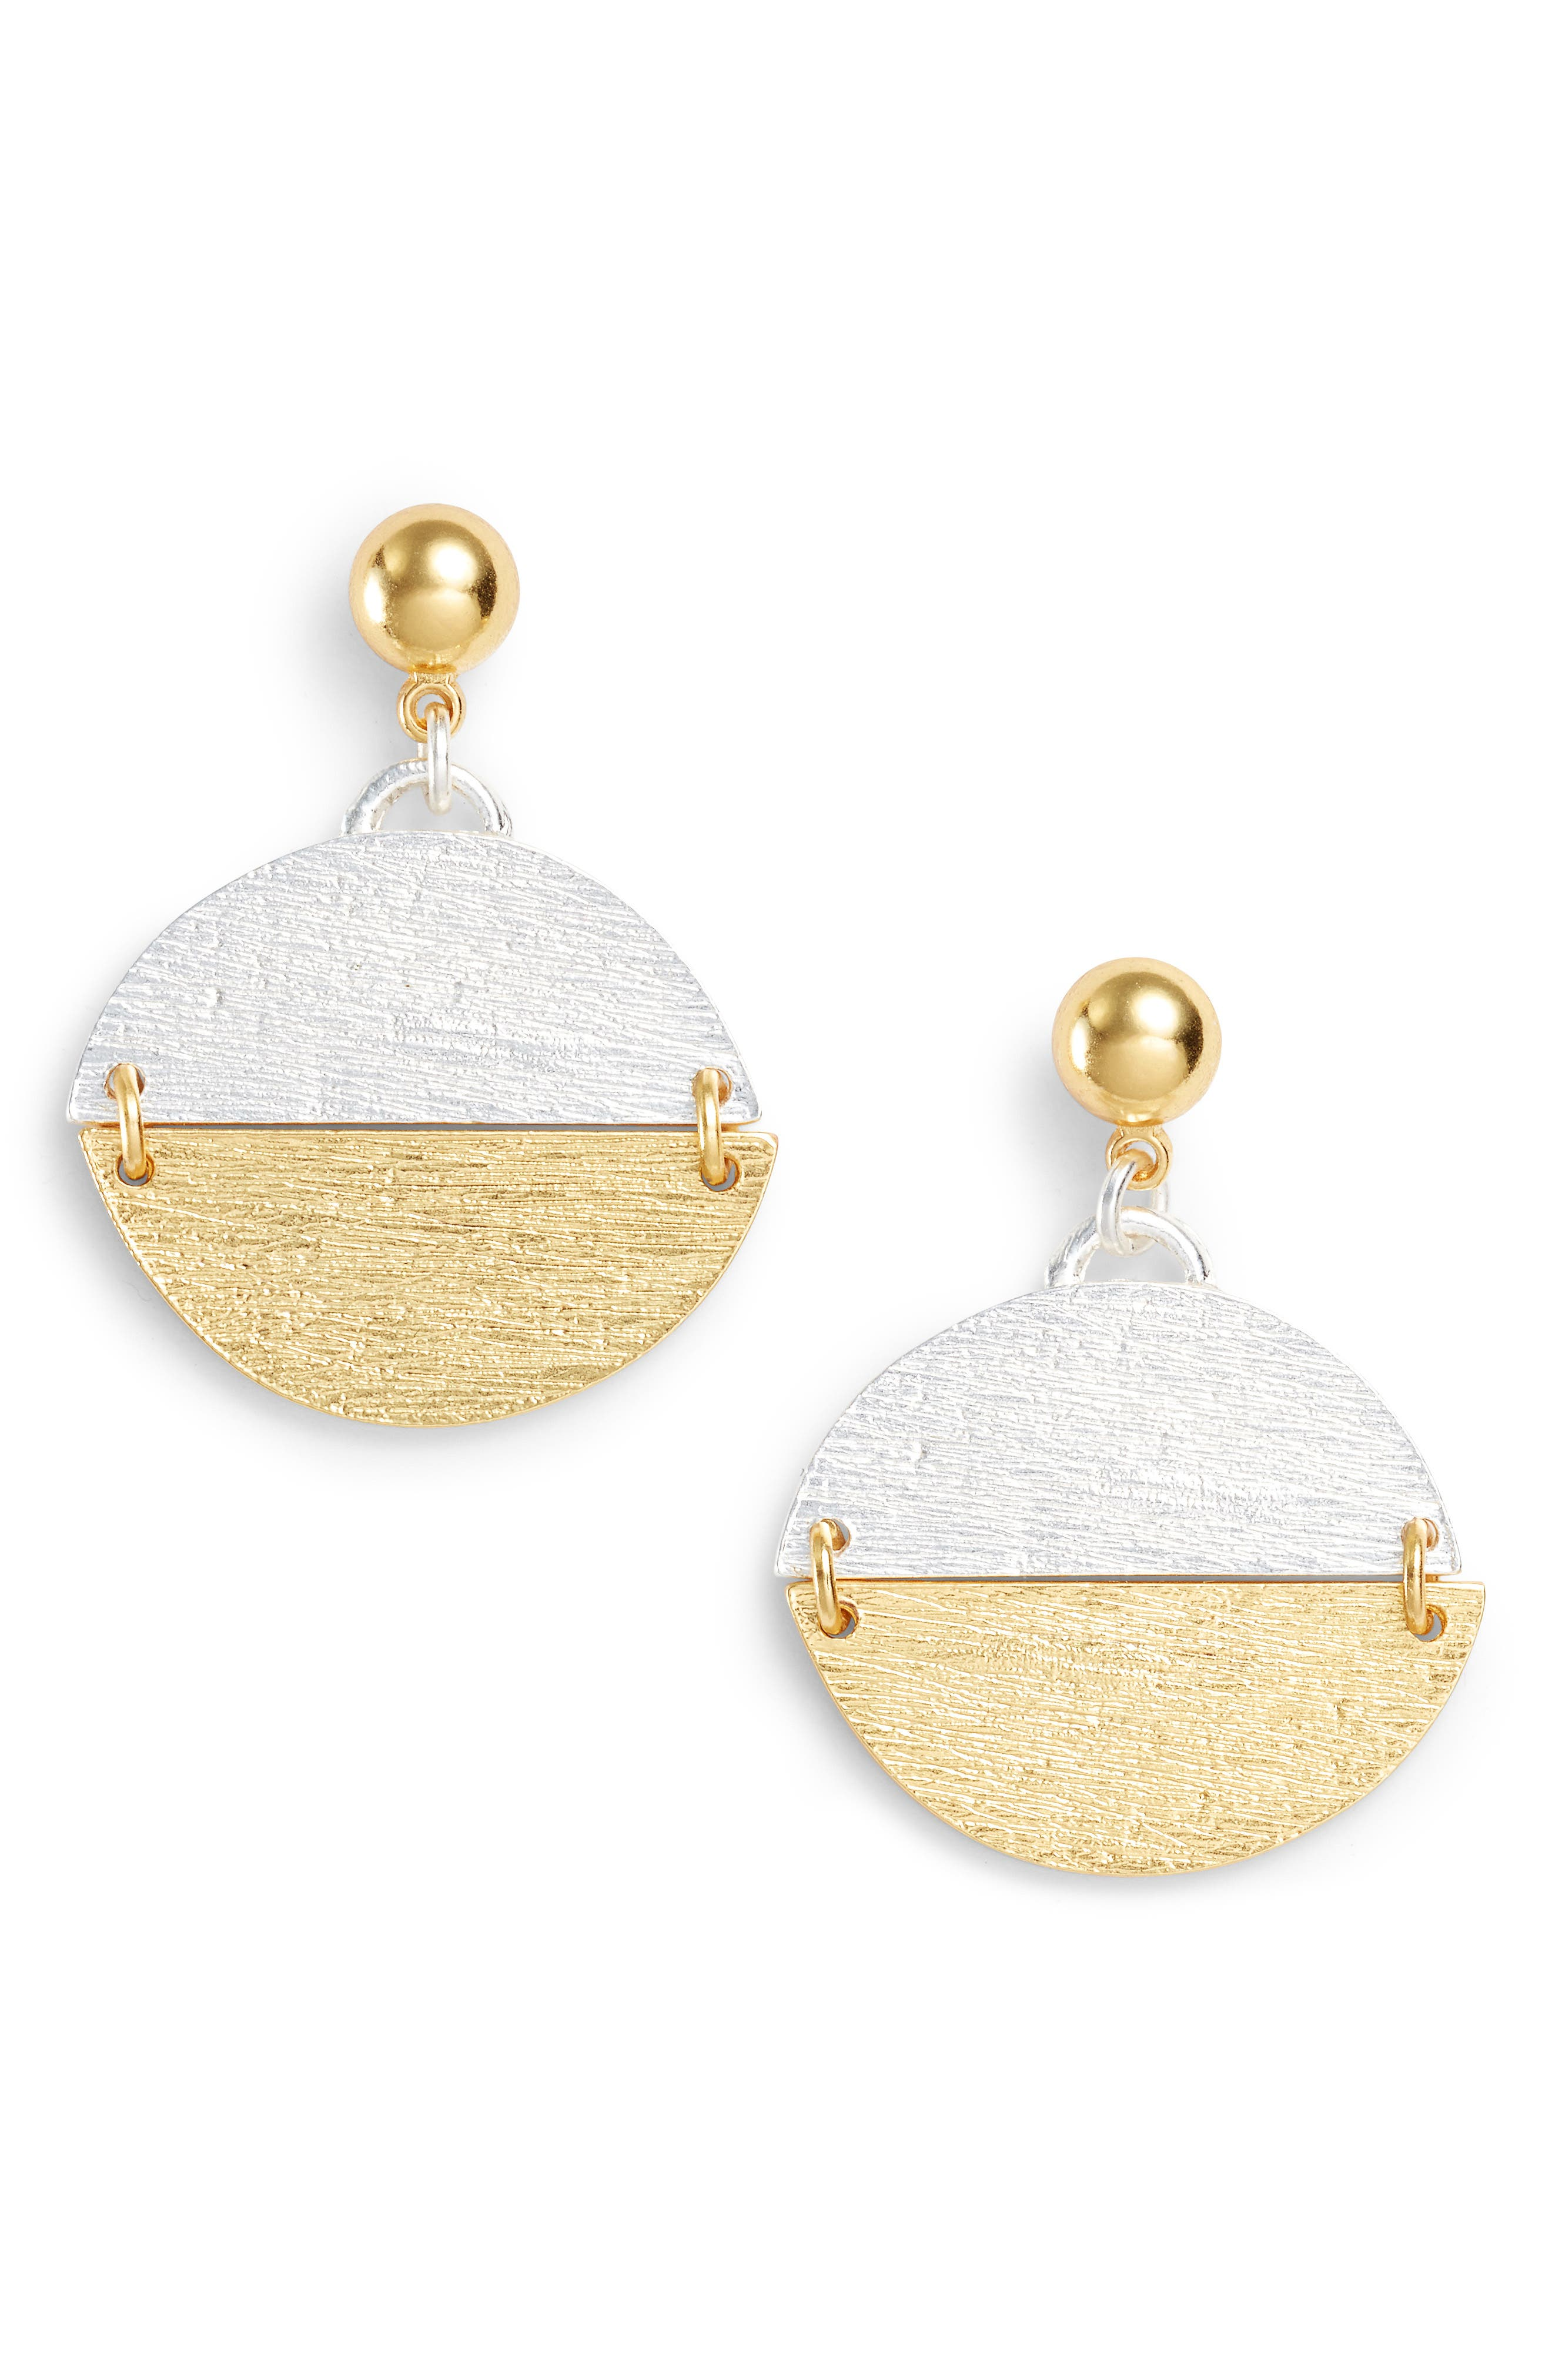 Pendant Drop Earrings,                         Main,                         color, Gold/Silver Mix